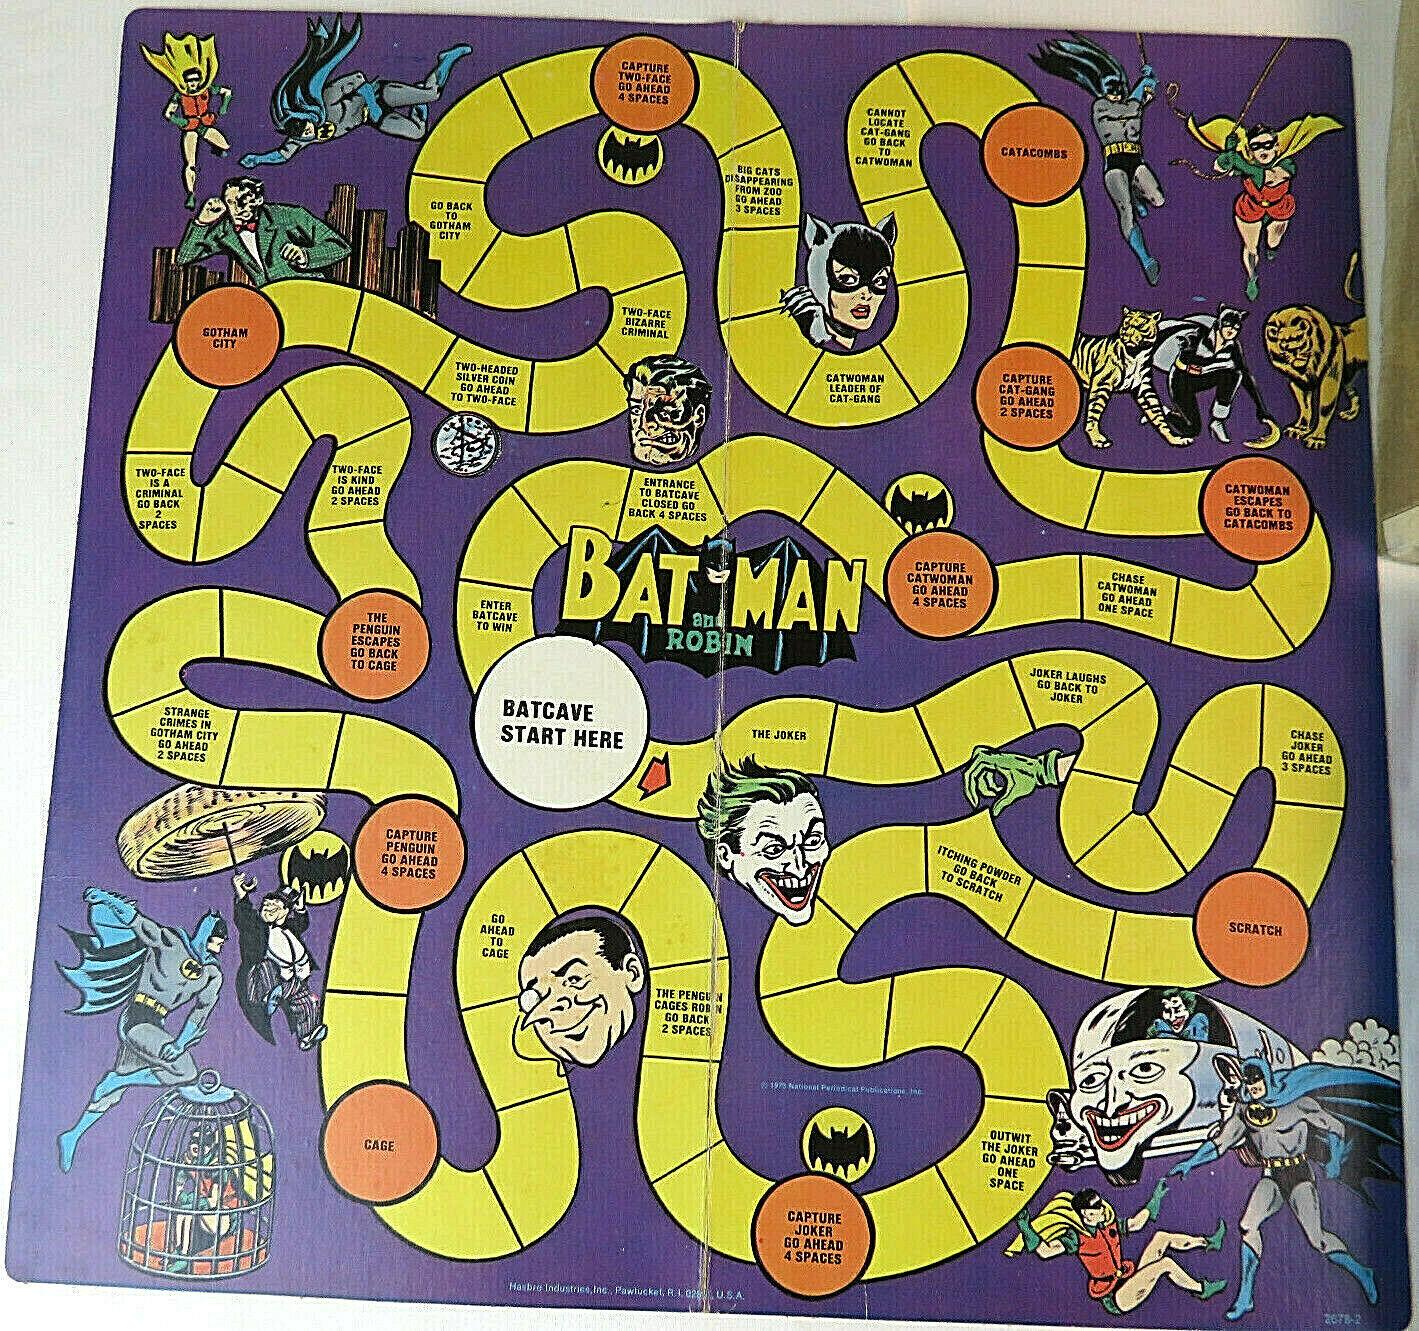 1973 Batman Board Game - Sällsynta Hasbro Vintage 1970 s DC Comics